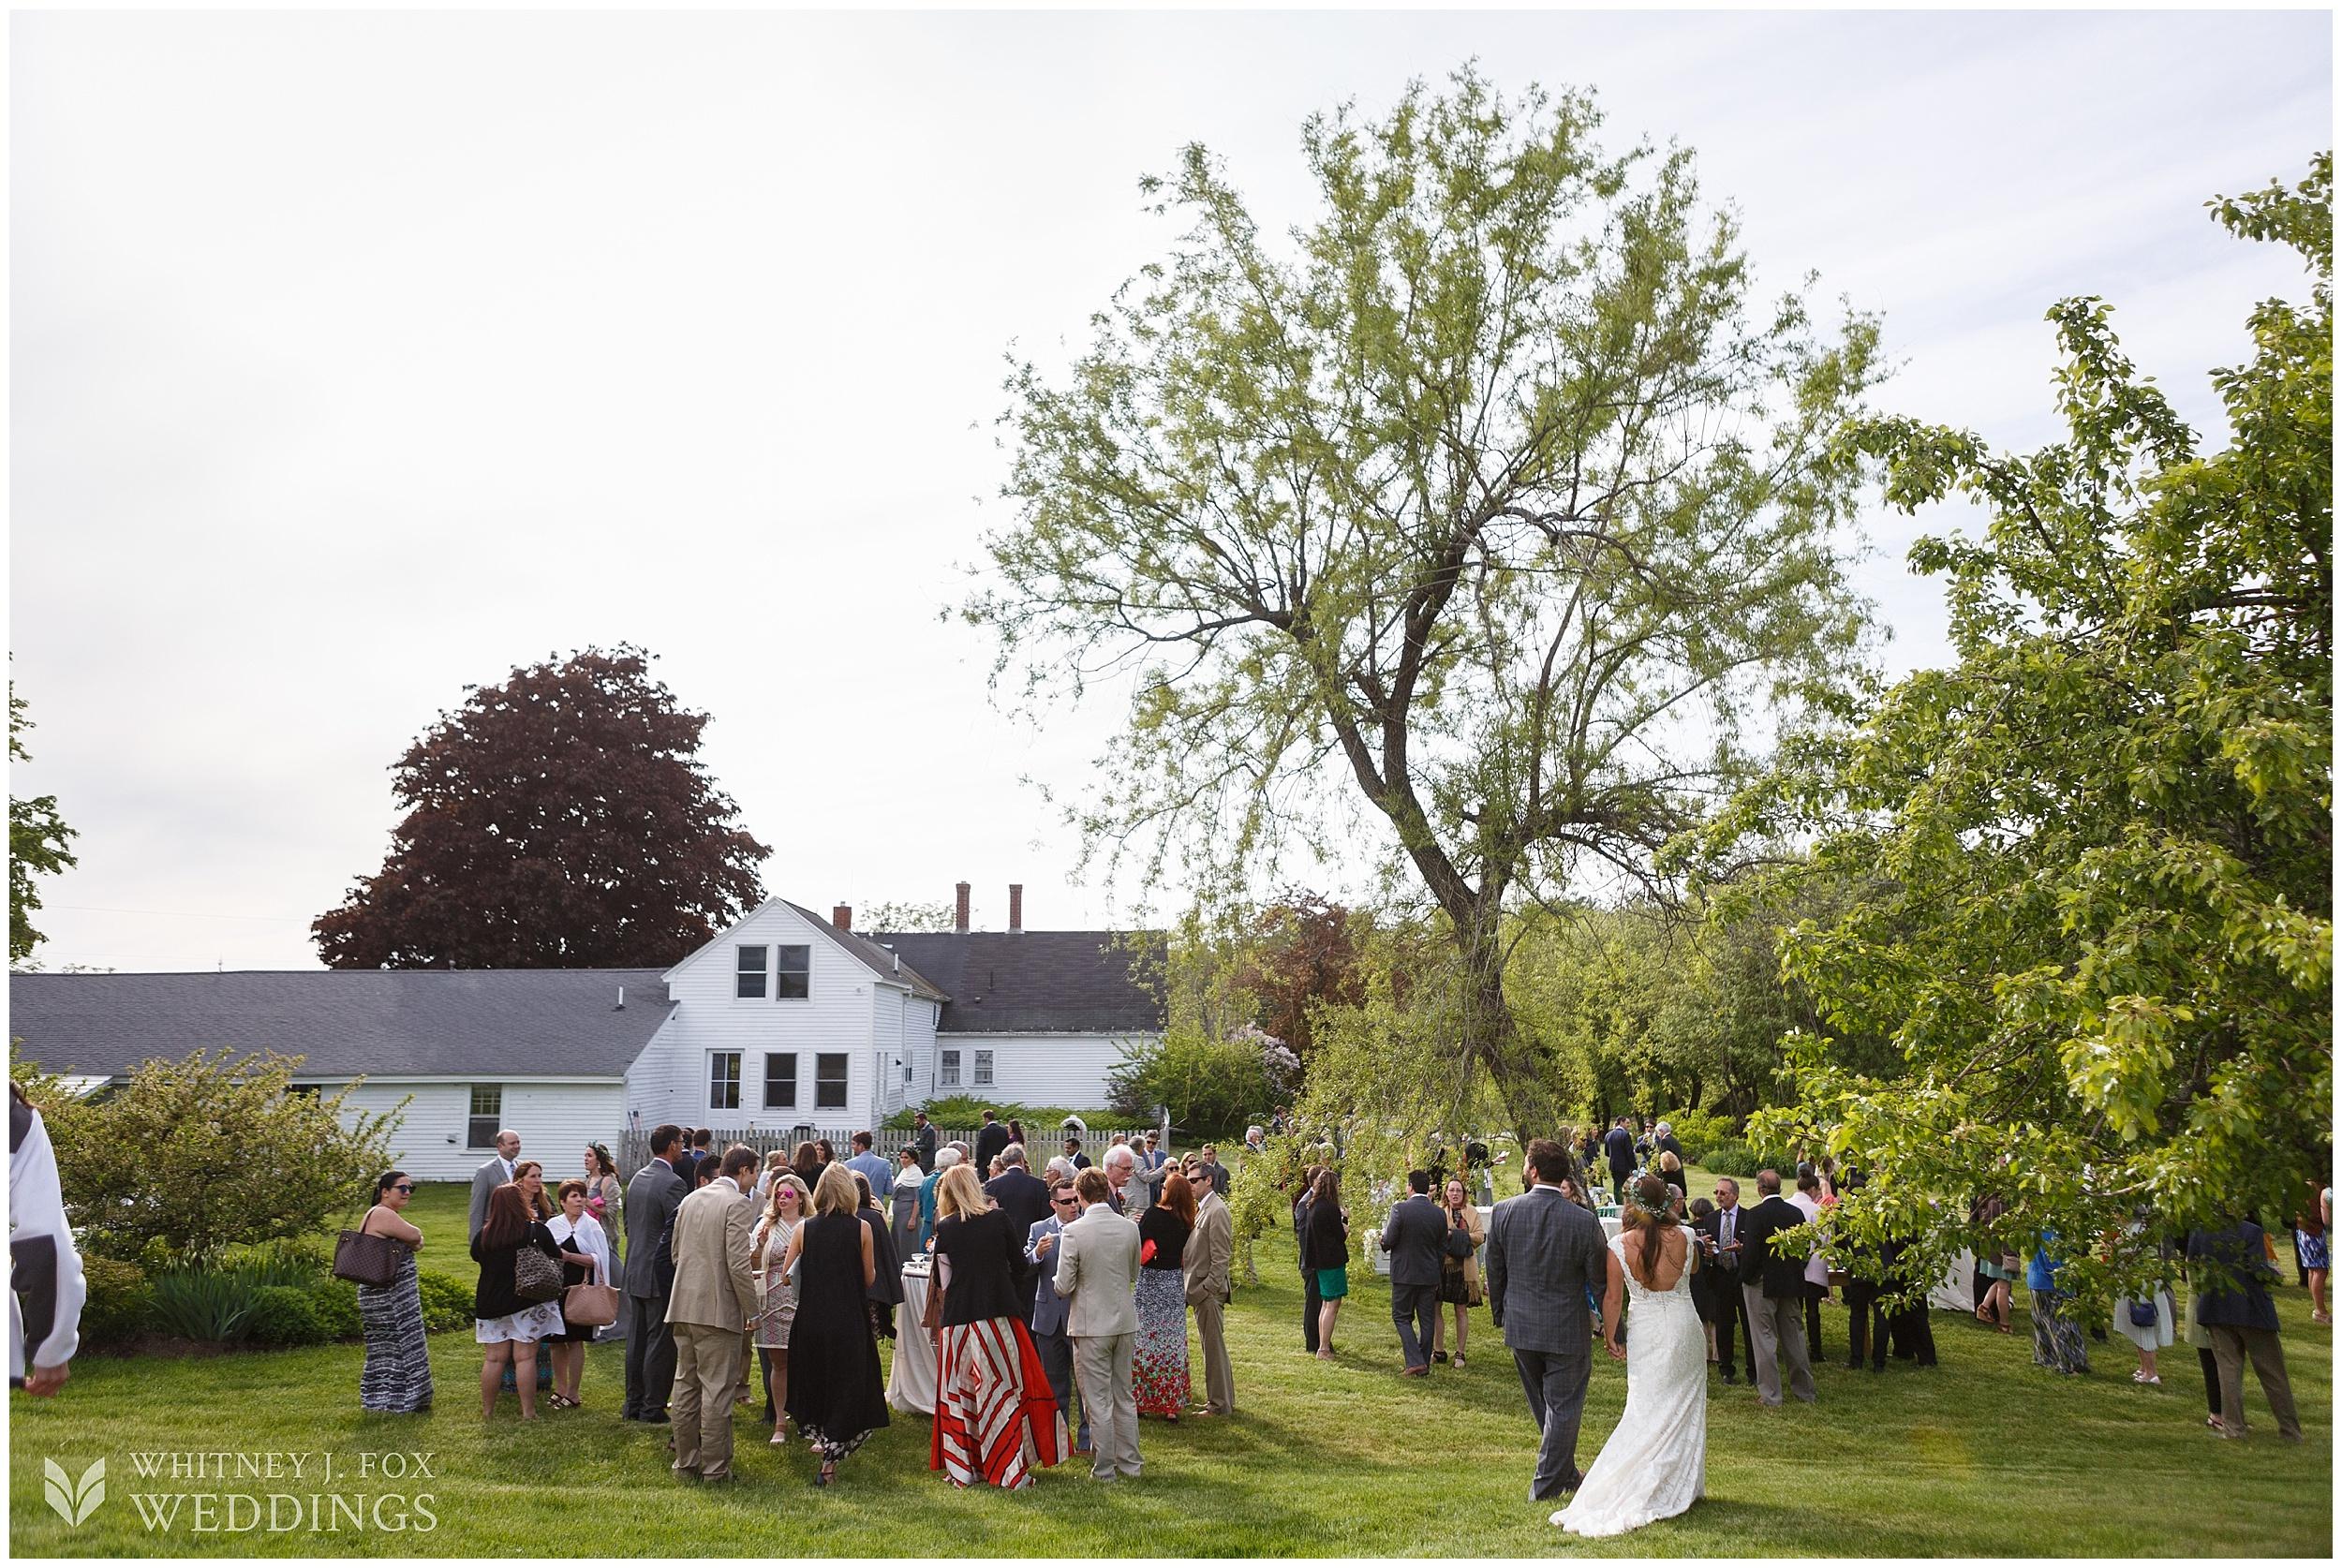 55_99_tai_josh_the_homestead_rest_be_thankful_farm_lyman_maine_photographer_whitney_j_fox_weddings_.jpg